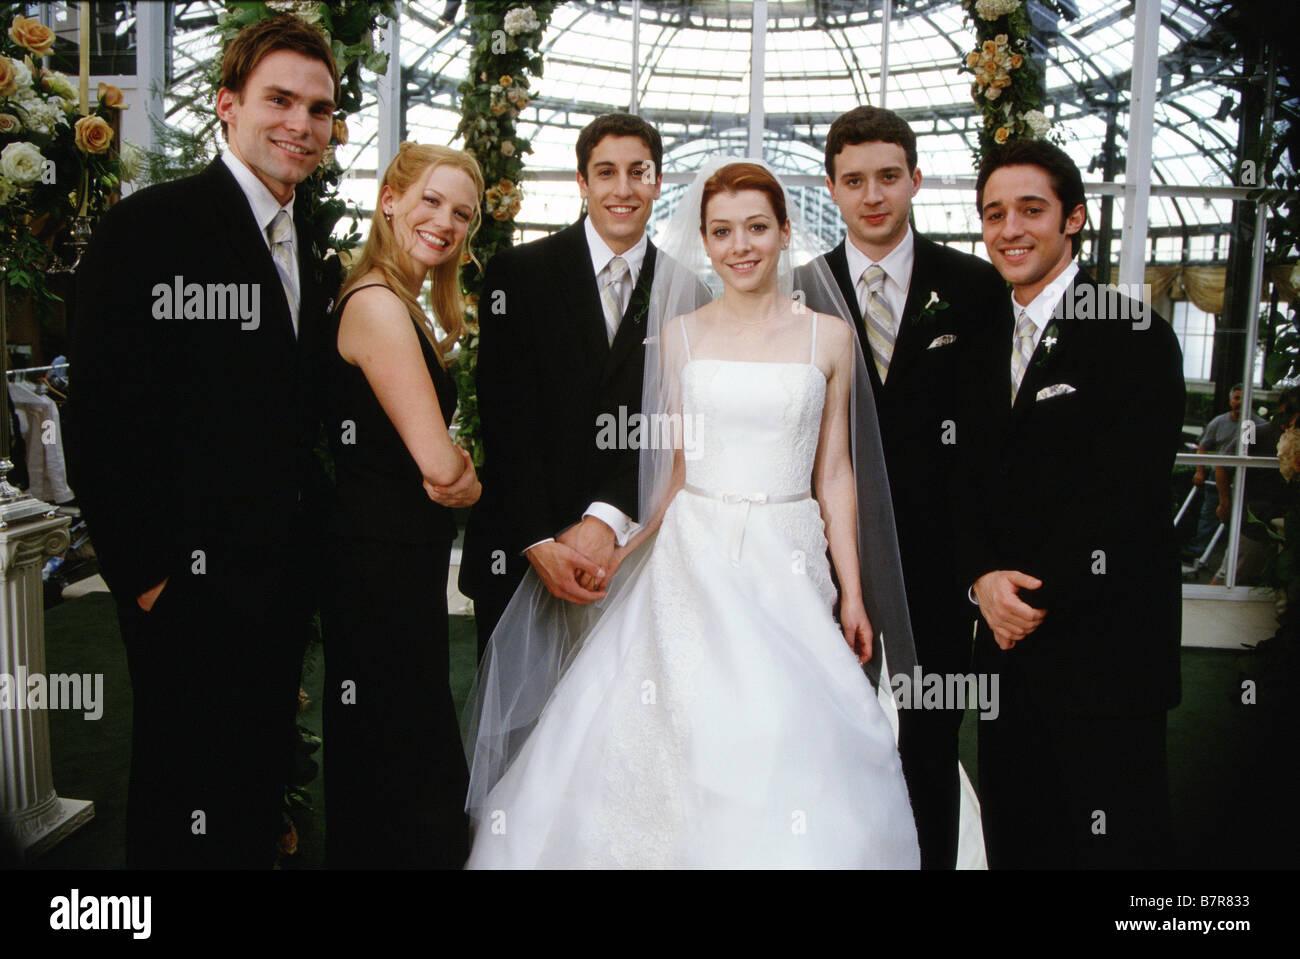 American Wedding  Year: 2003 USA  Eddie Kaye Thomas, Thomas Ian Nicholas, January Jones  Year: I - , Seann William - Stock Image